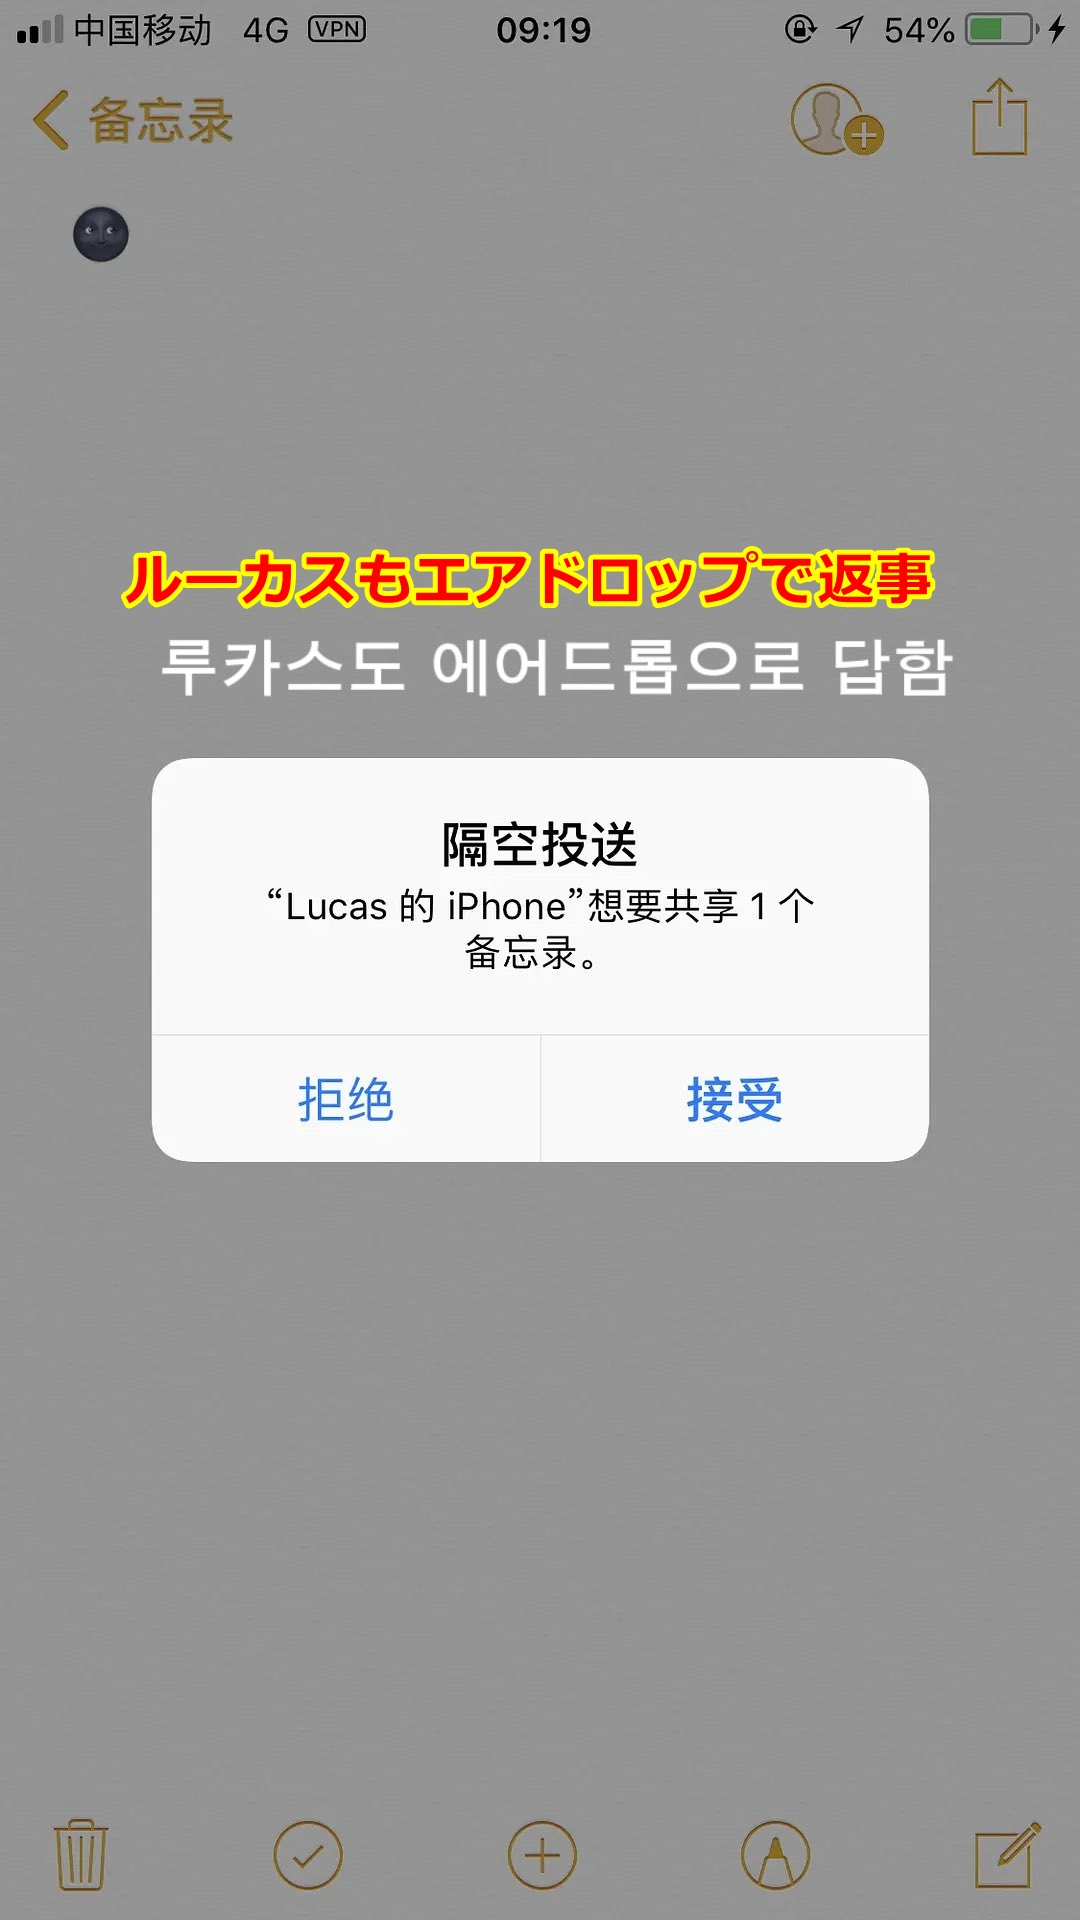 NCT WayV ルーカス